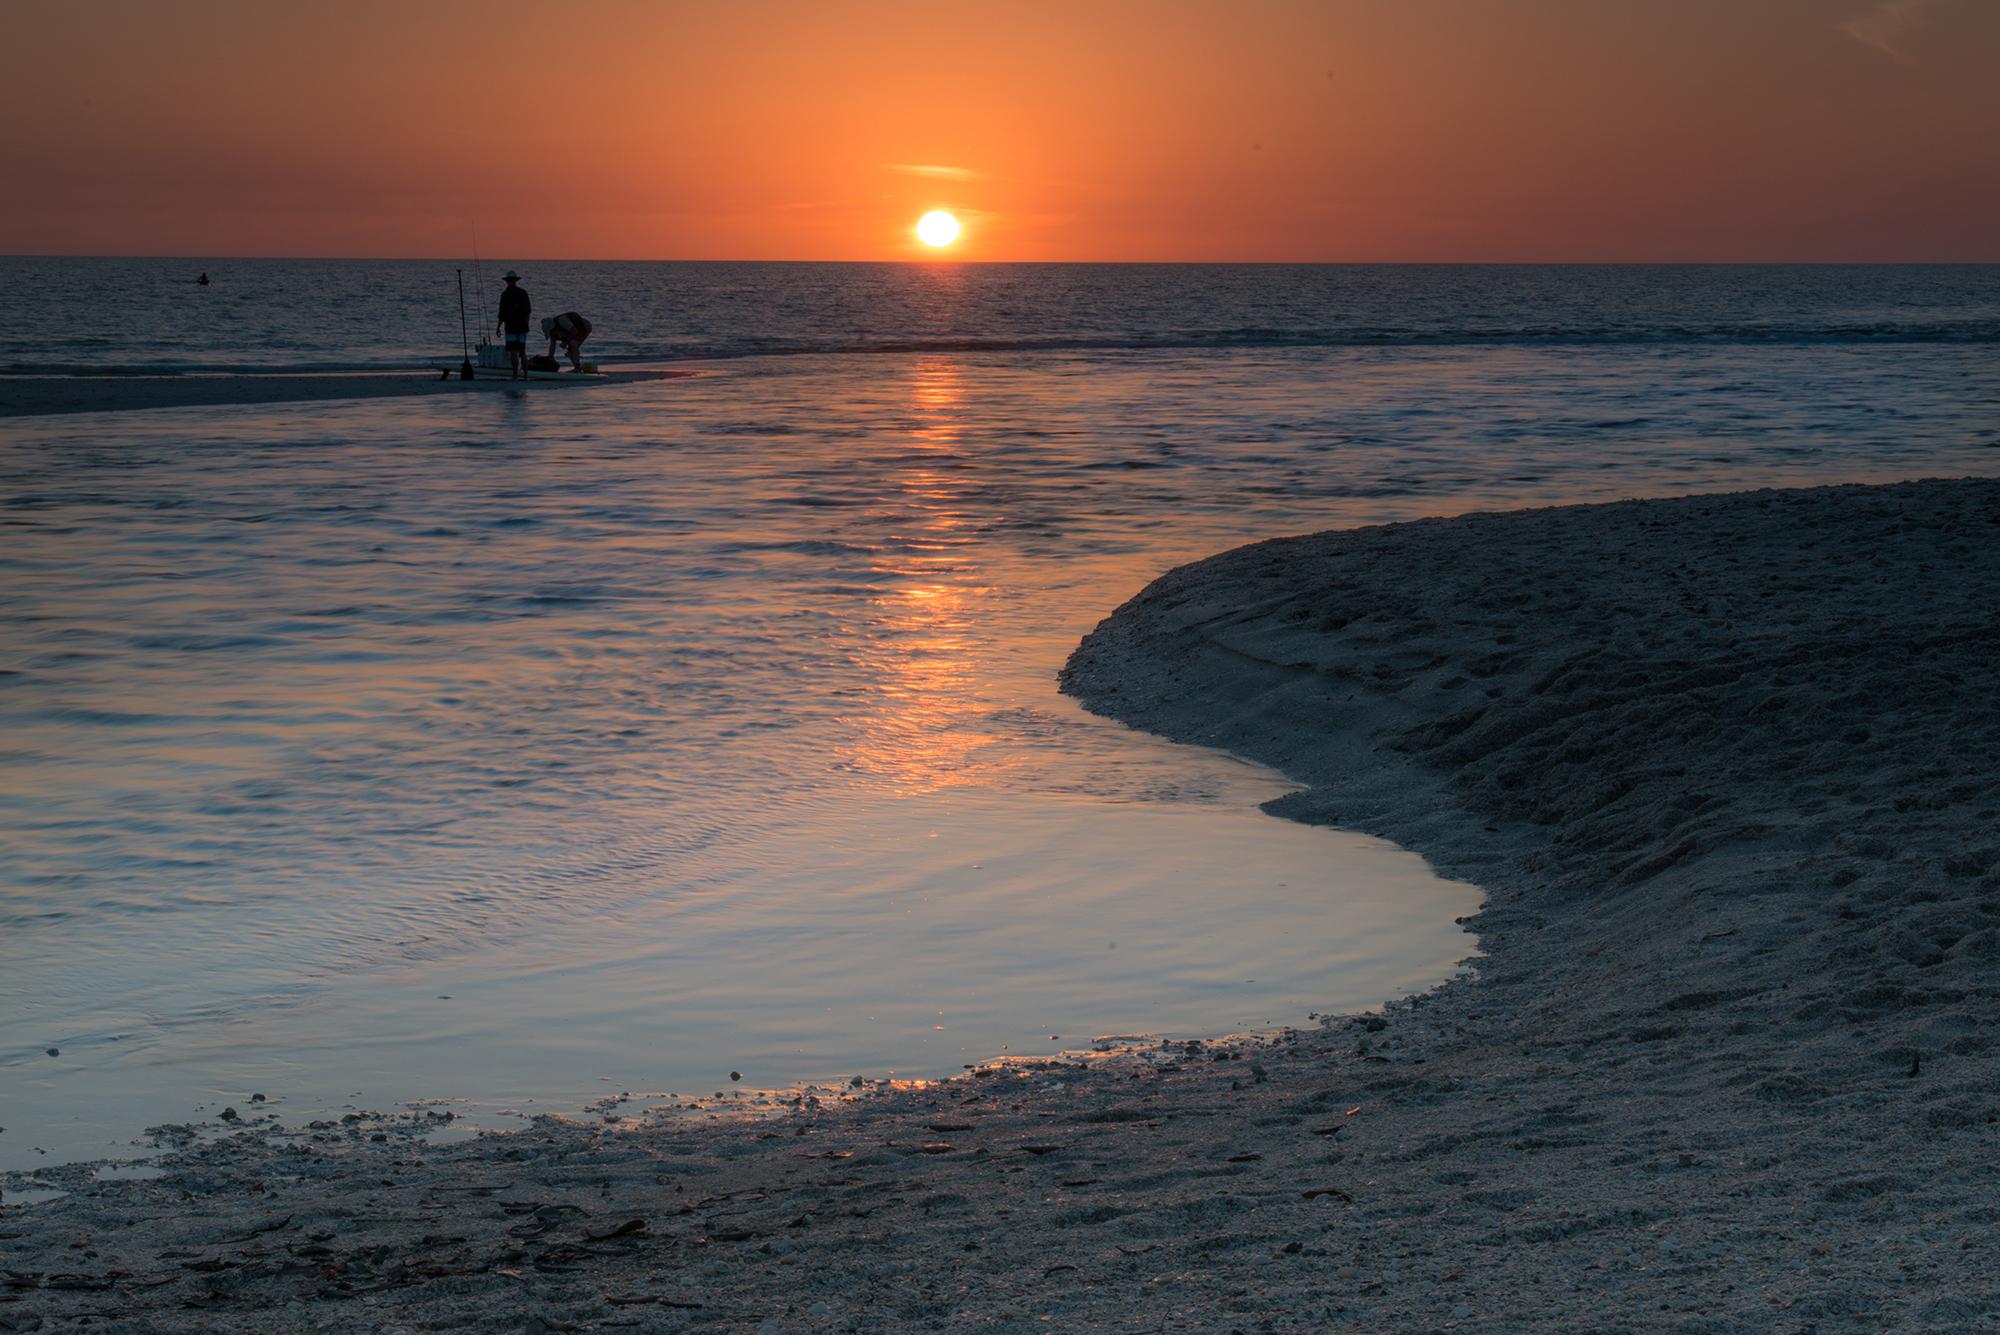 #sunset, #fishermen, #orange, #naples, #florida, #pelicanbay, #peaceful, #orangeandblue